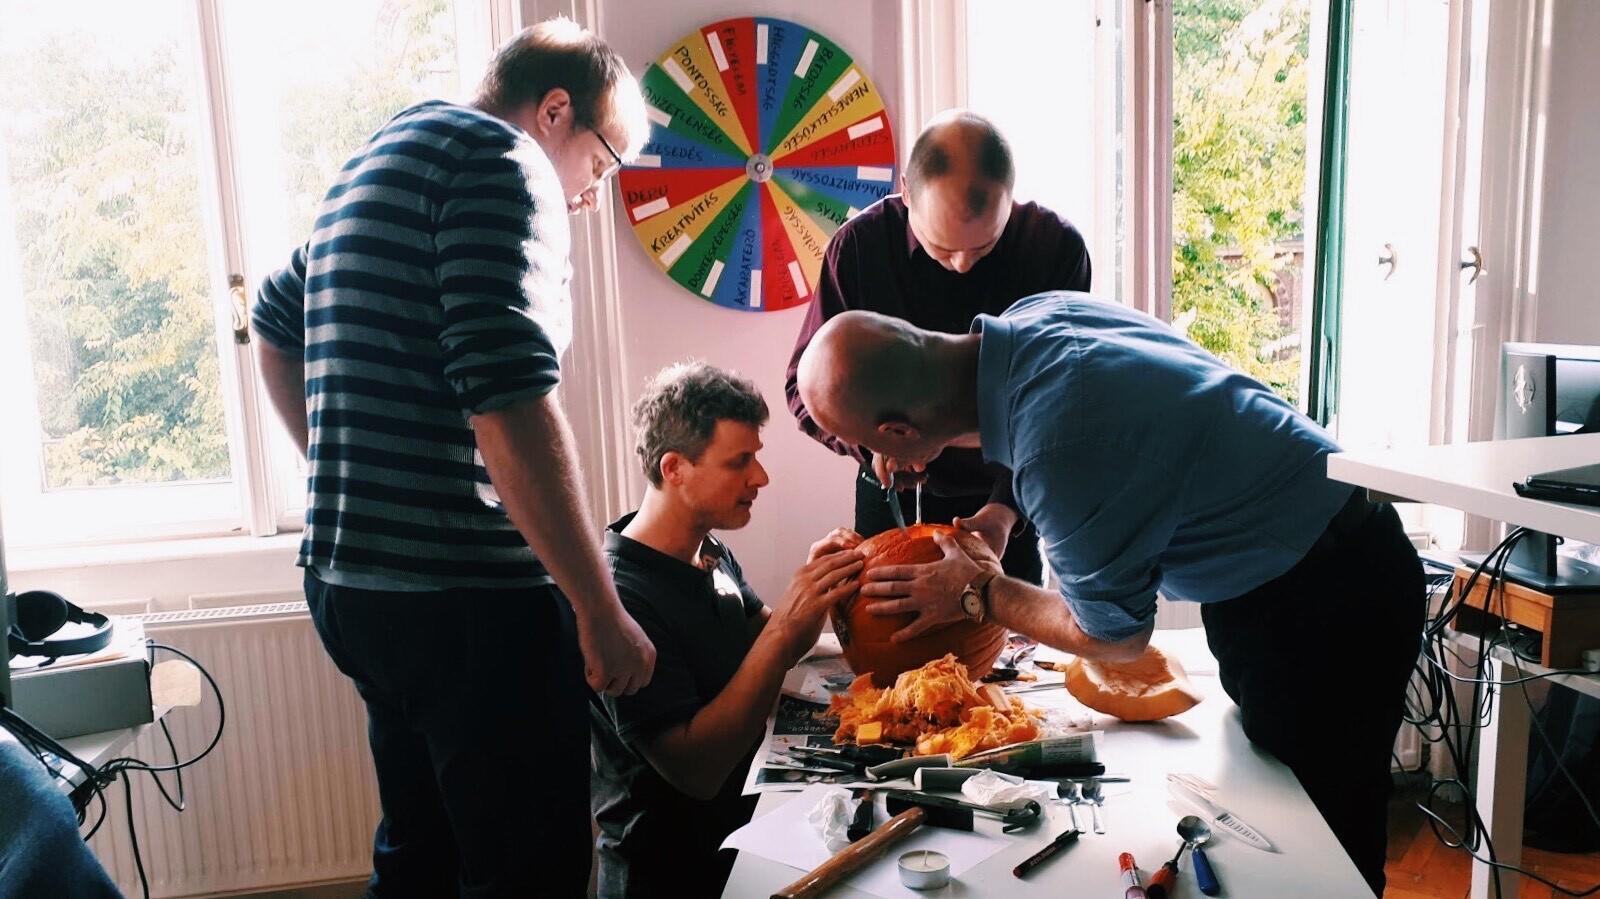 The engineering team carving their Halloween pumpkin